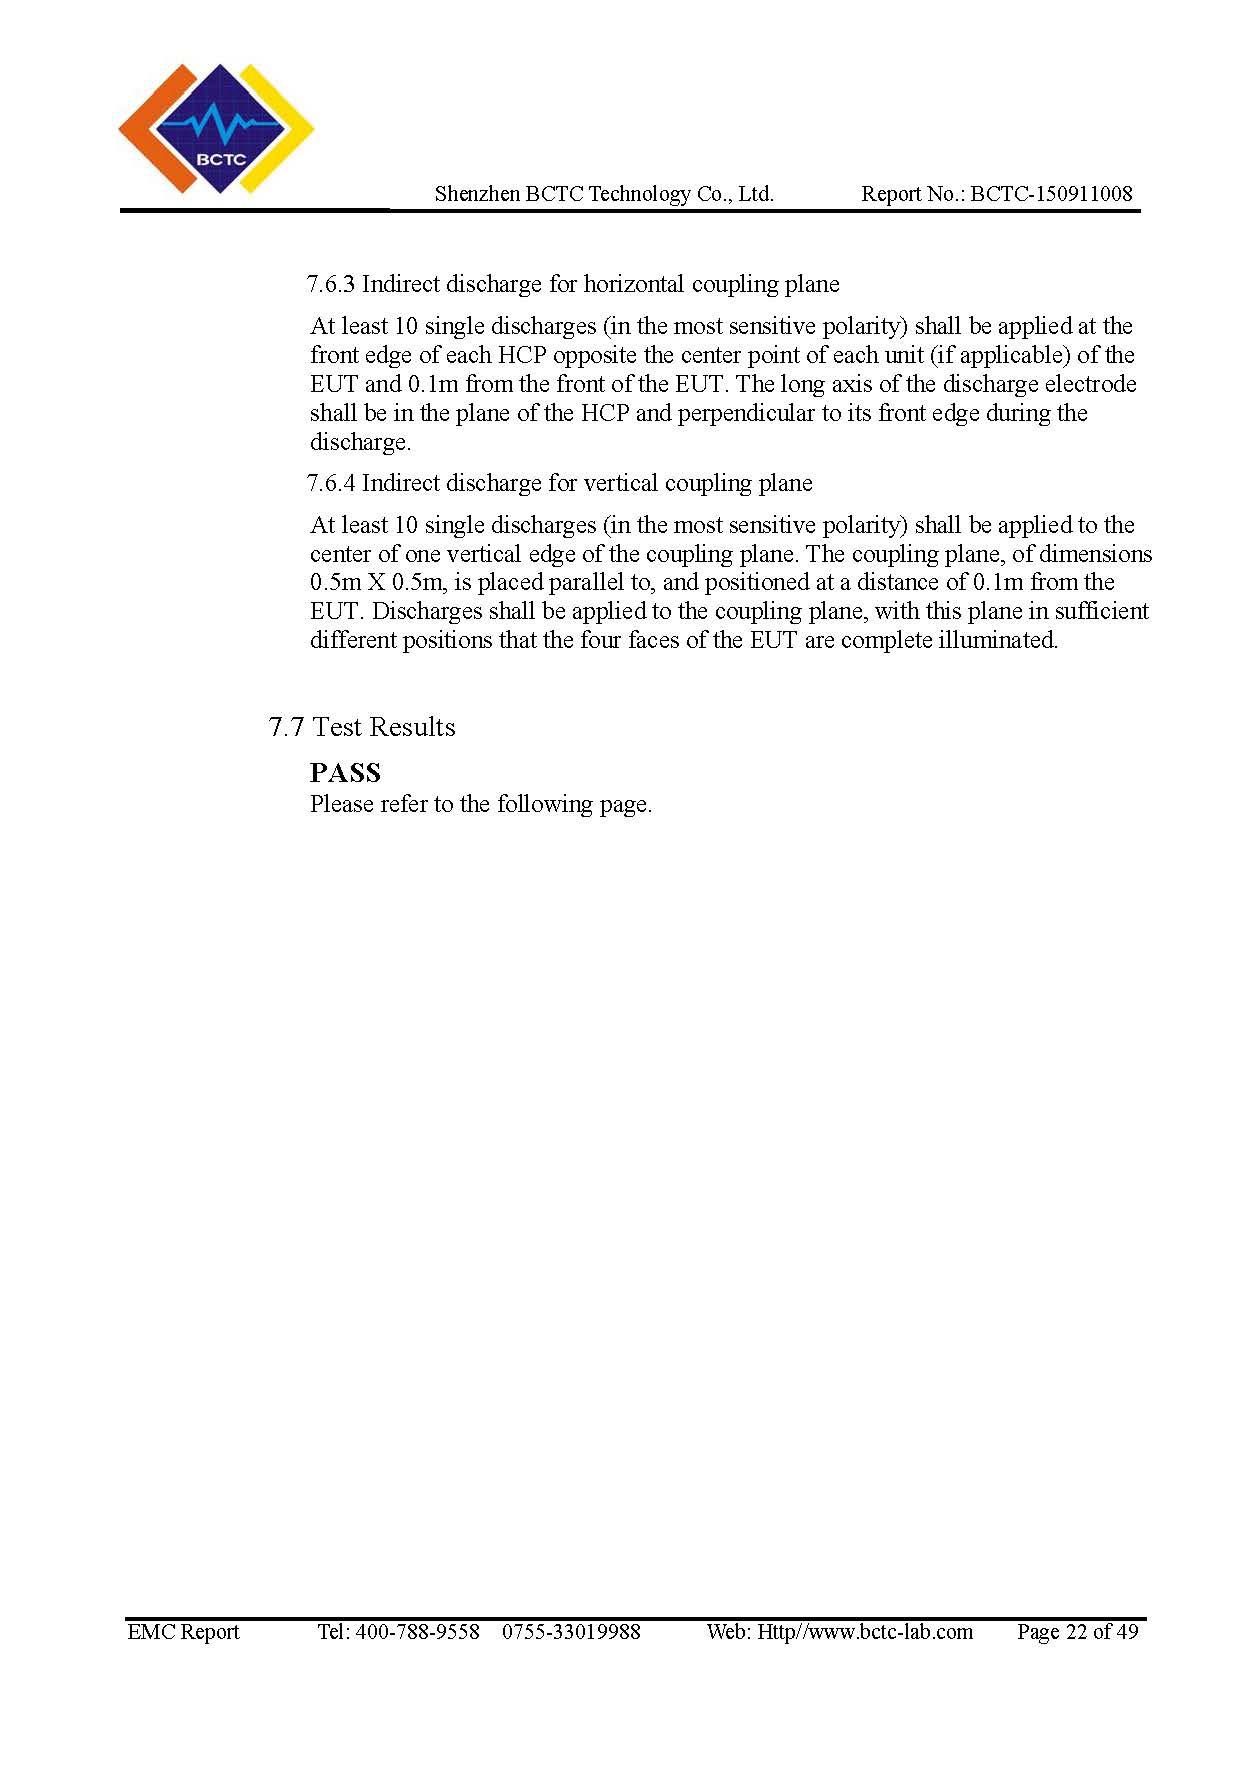 breathe-safe-ce-report-page-22.jpg